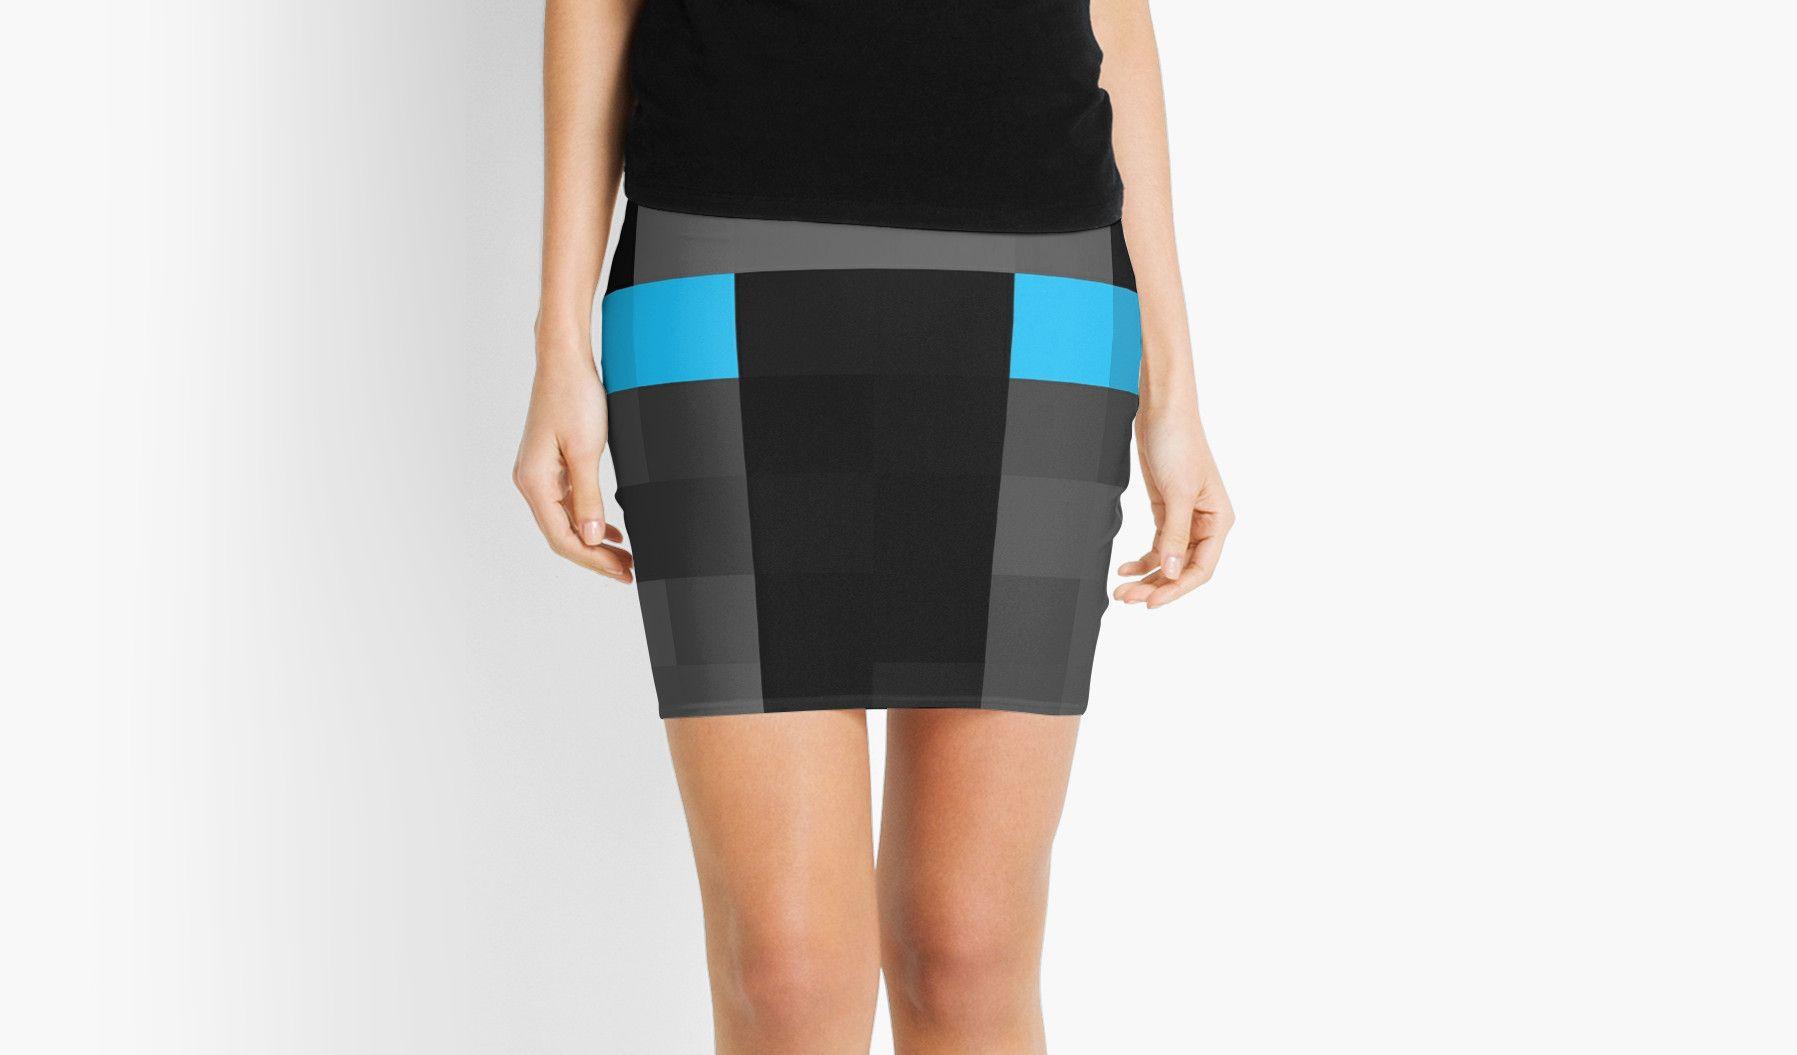 957412268 popularMMos Minecraft skin Minecraft Skins, Mini Skirts, Mini Skirt